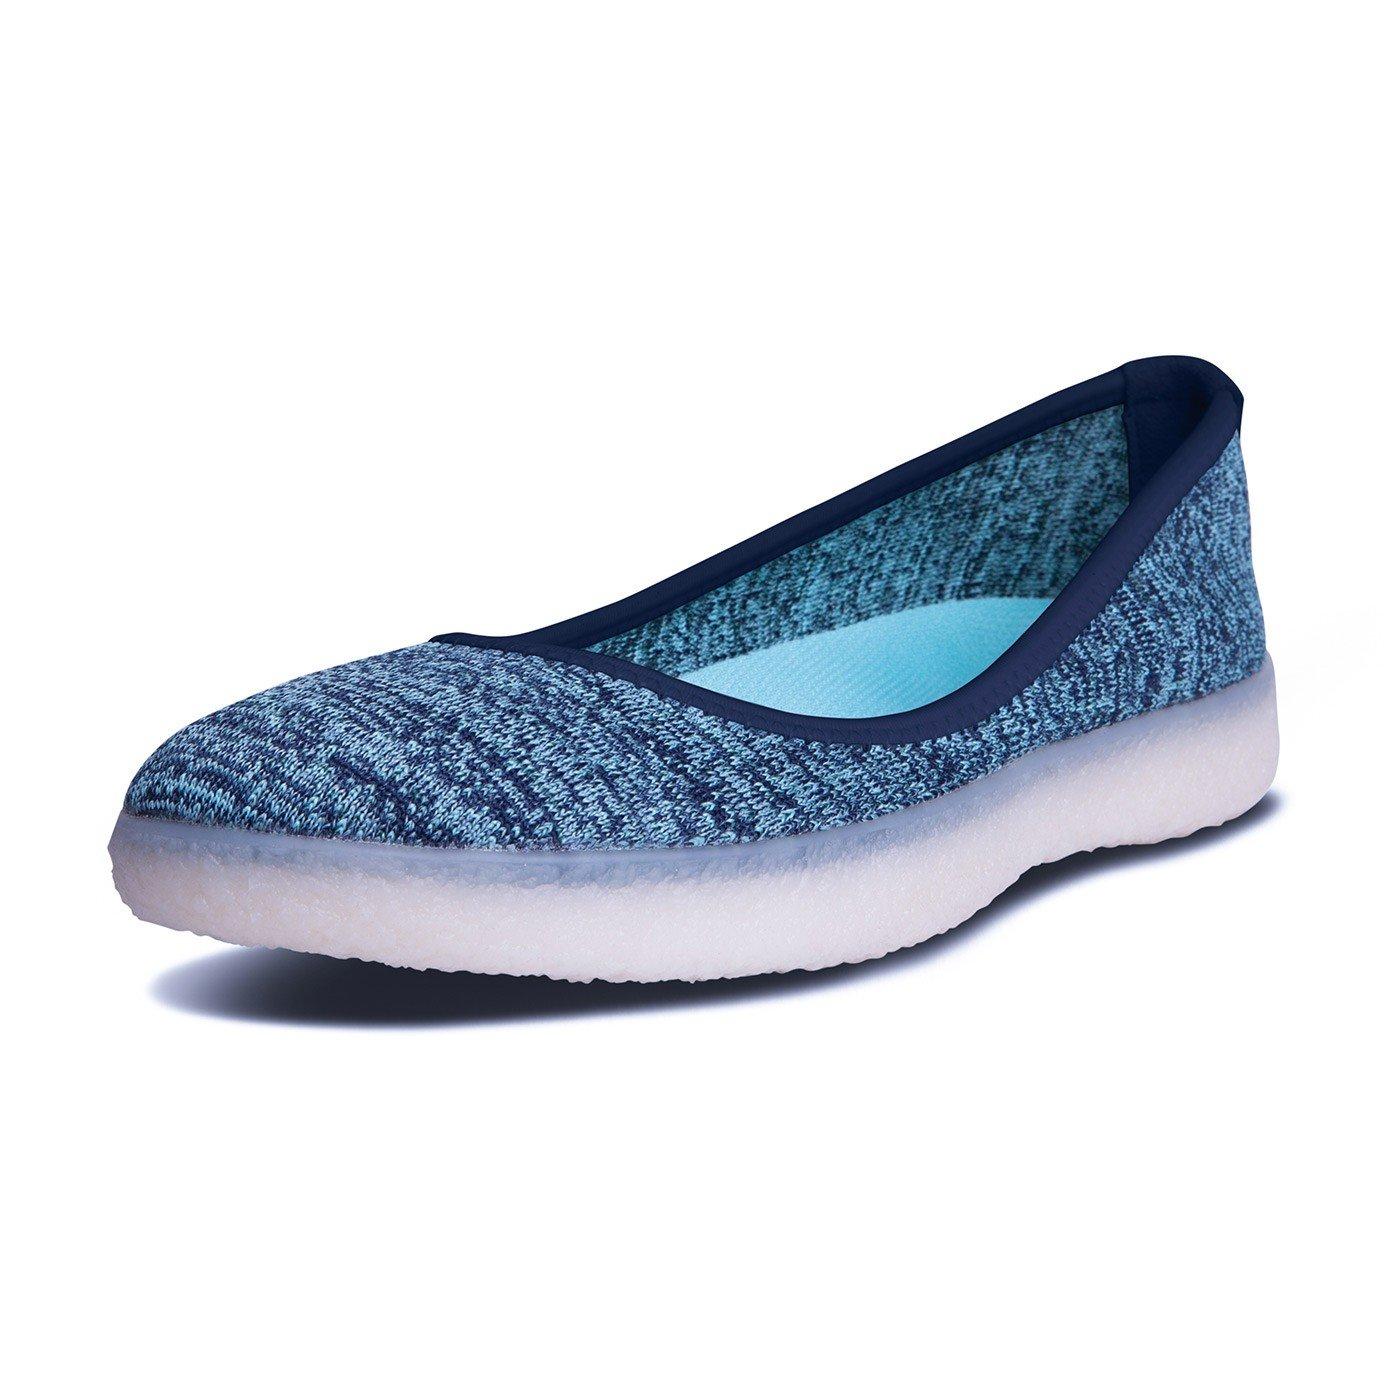 BluPrint La Jolla Women's Stylish Knitted Ballet Flat Every-Day Shoe with BluPrint CLOUD IMPRINT Comfort Technology - Size 8 - Ocean Blue